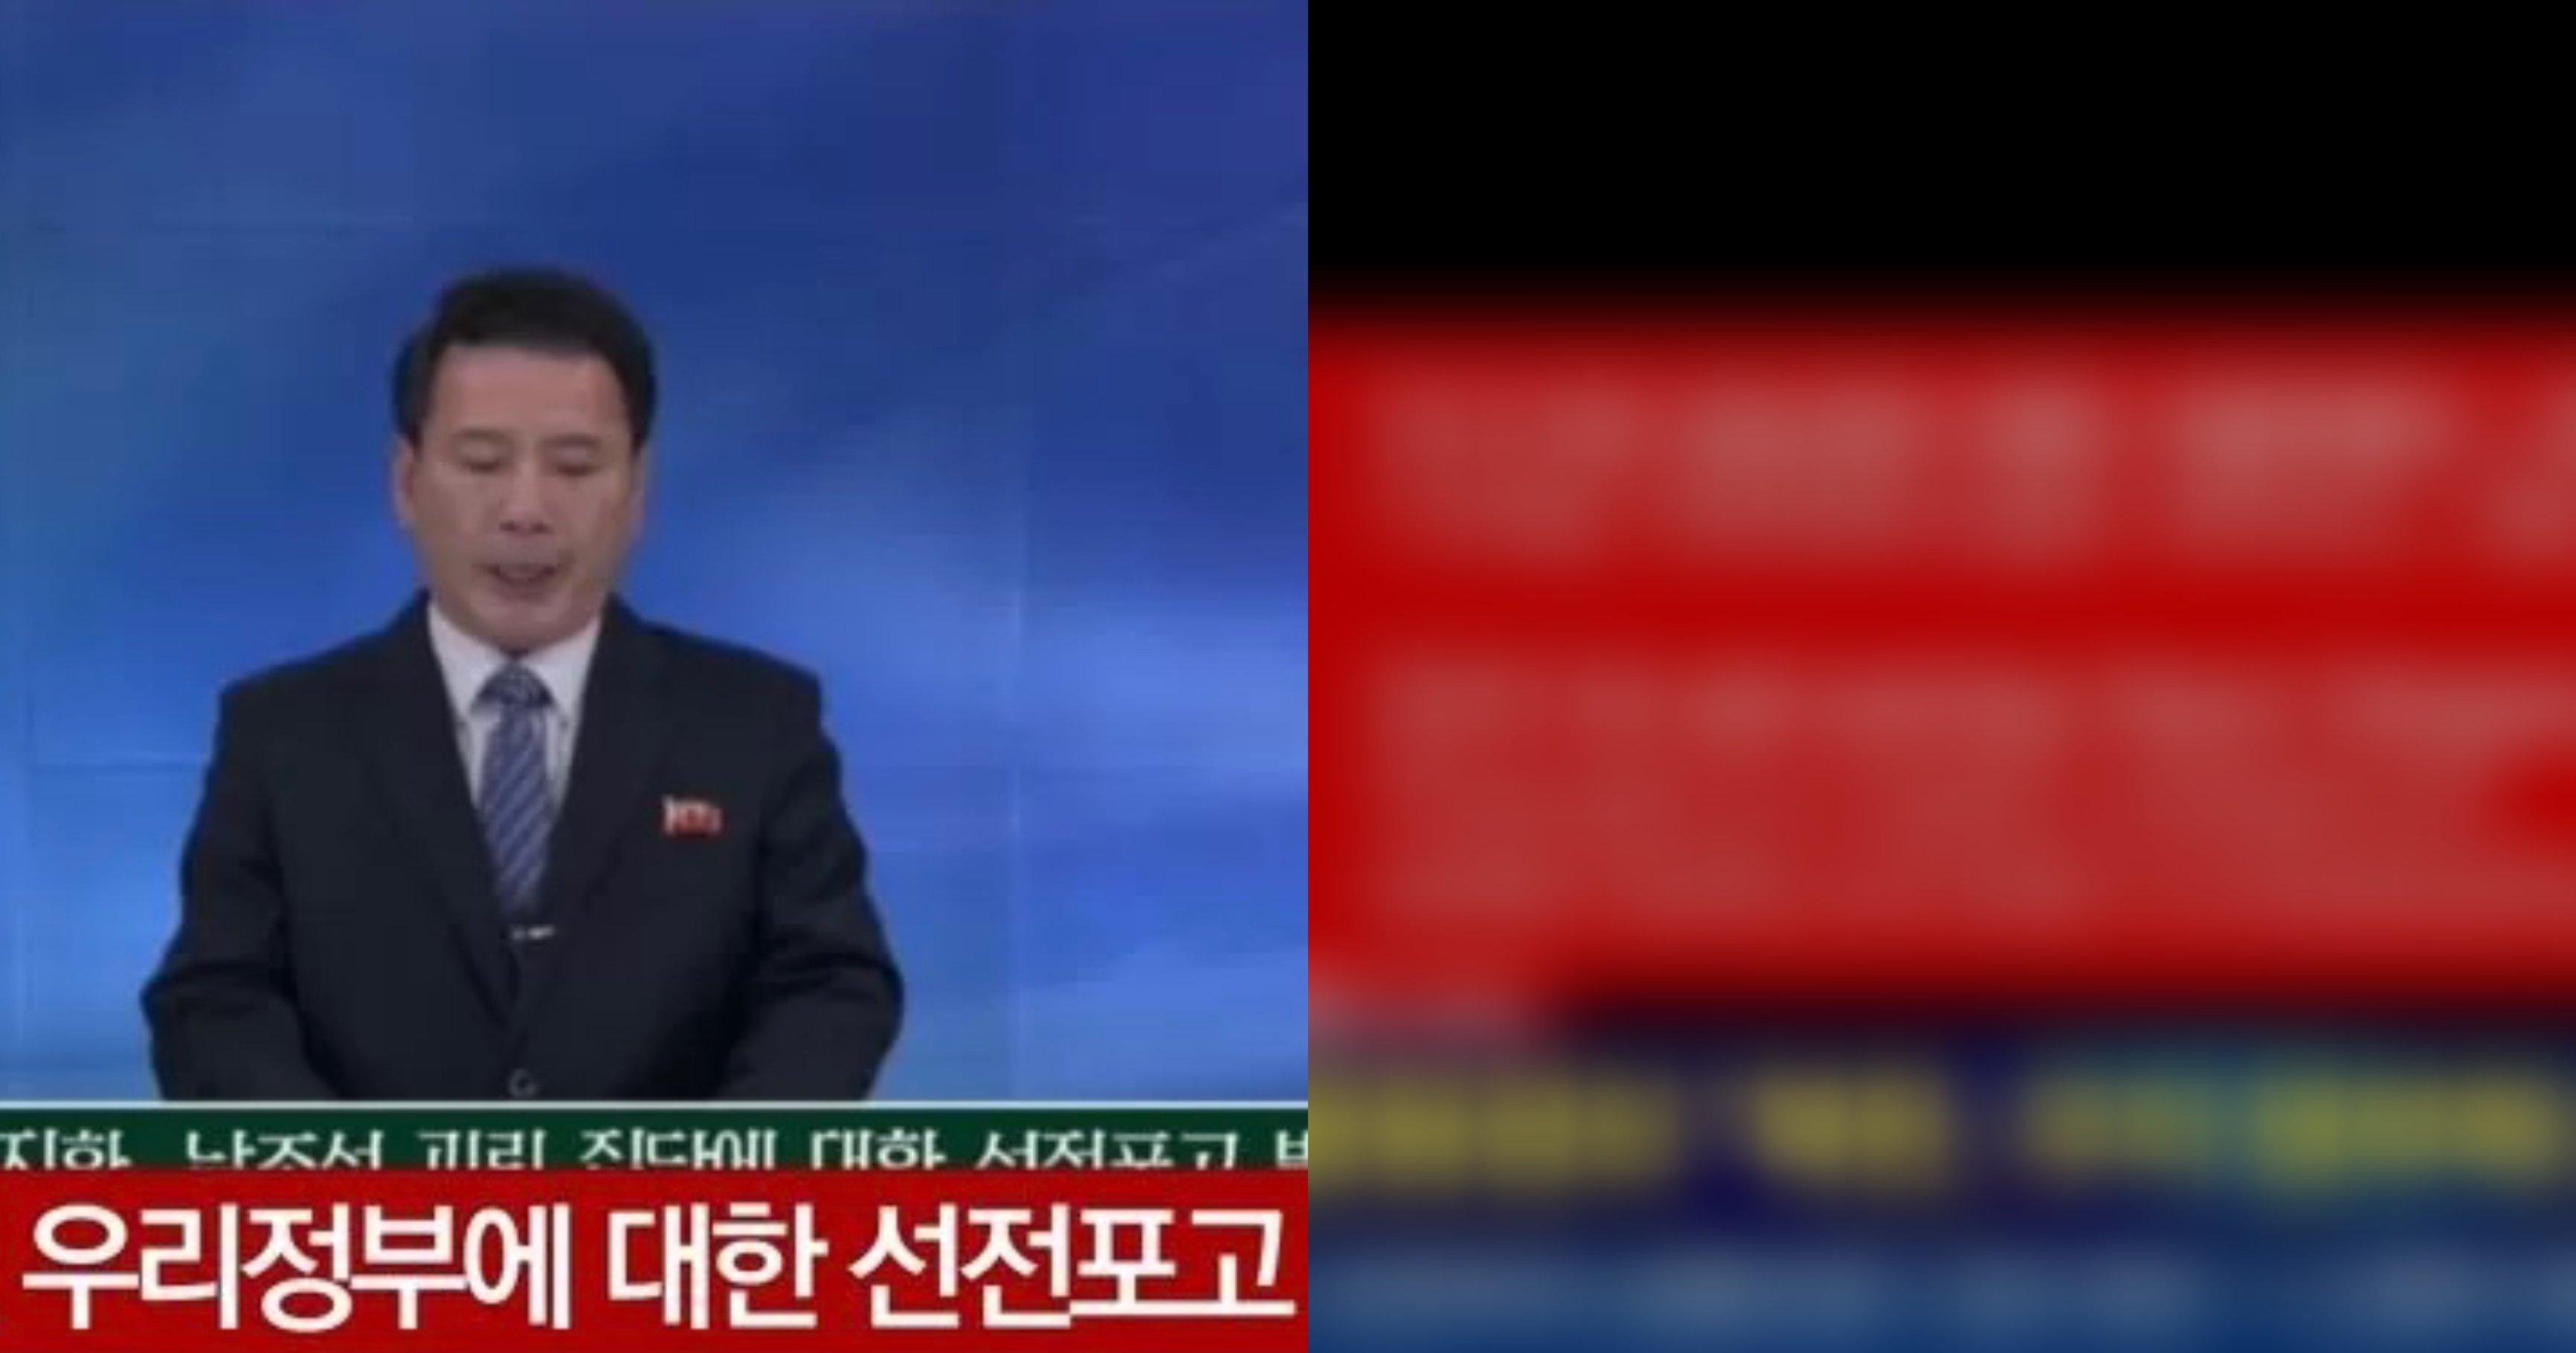 img 9bd3936bdb0e 1.jpeg?resize=412,232 - 북한과 전쟁이 벌어졌을 때 우리가 TV로 보게 될 화면(+사진)